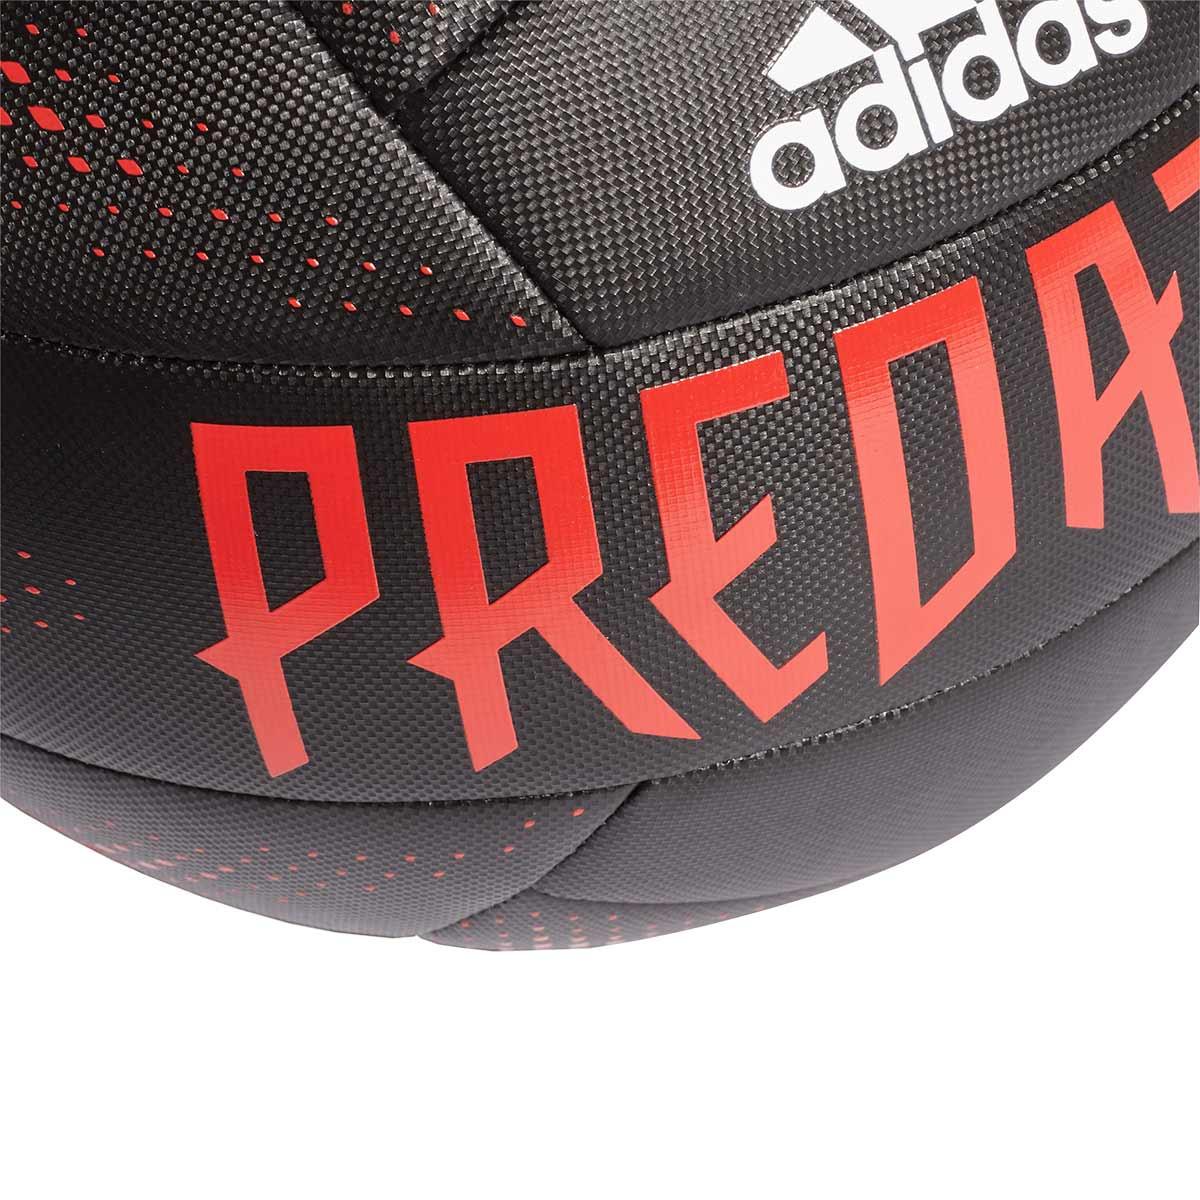 Final Prisionero buque de vapor  Ball adidas Predator Training Black-Active red-White - Football store  Fútbol Emotion